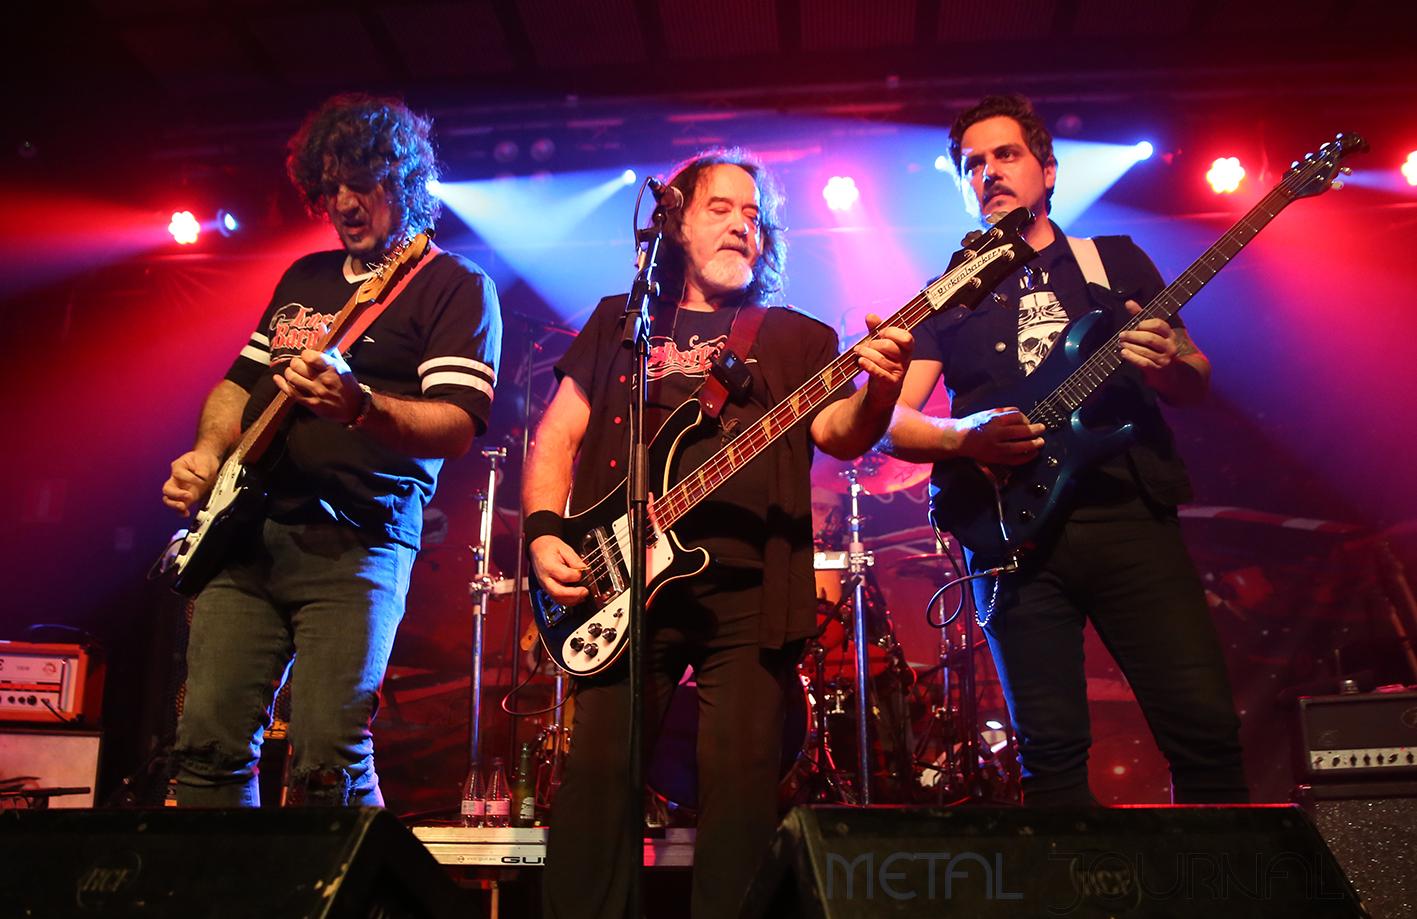 los barones - metal journal bilbao 2019 pic 3